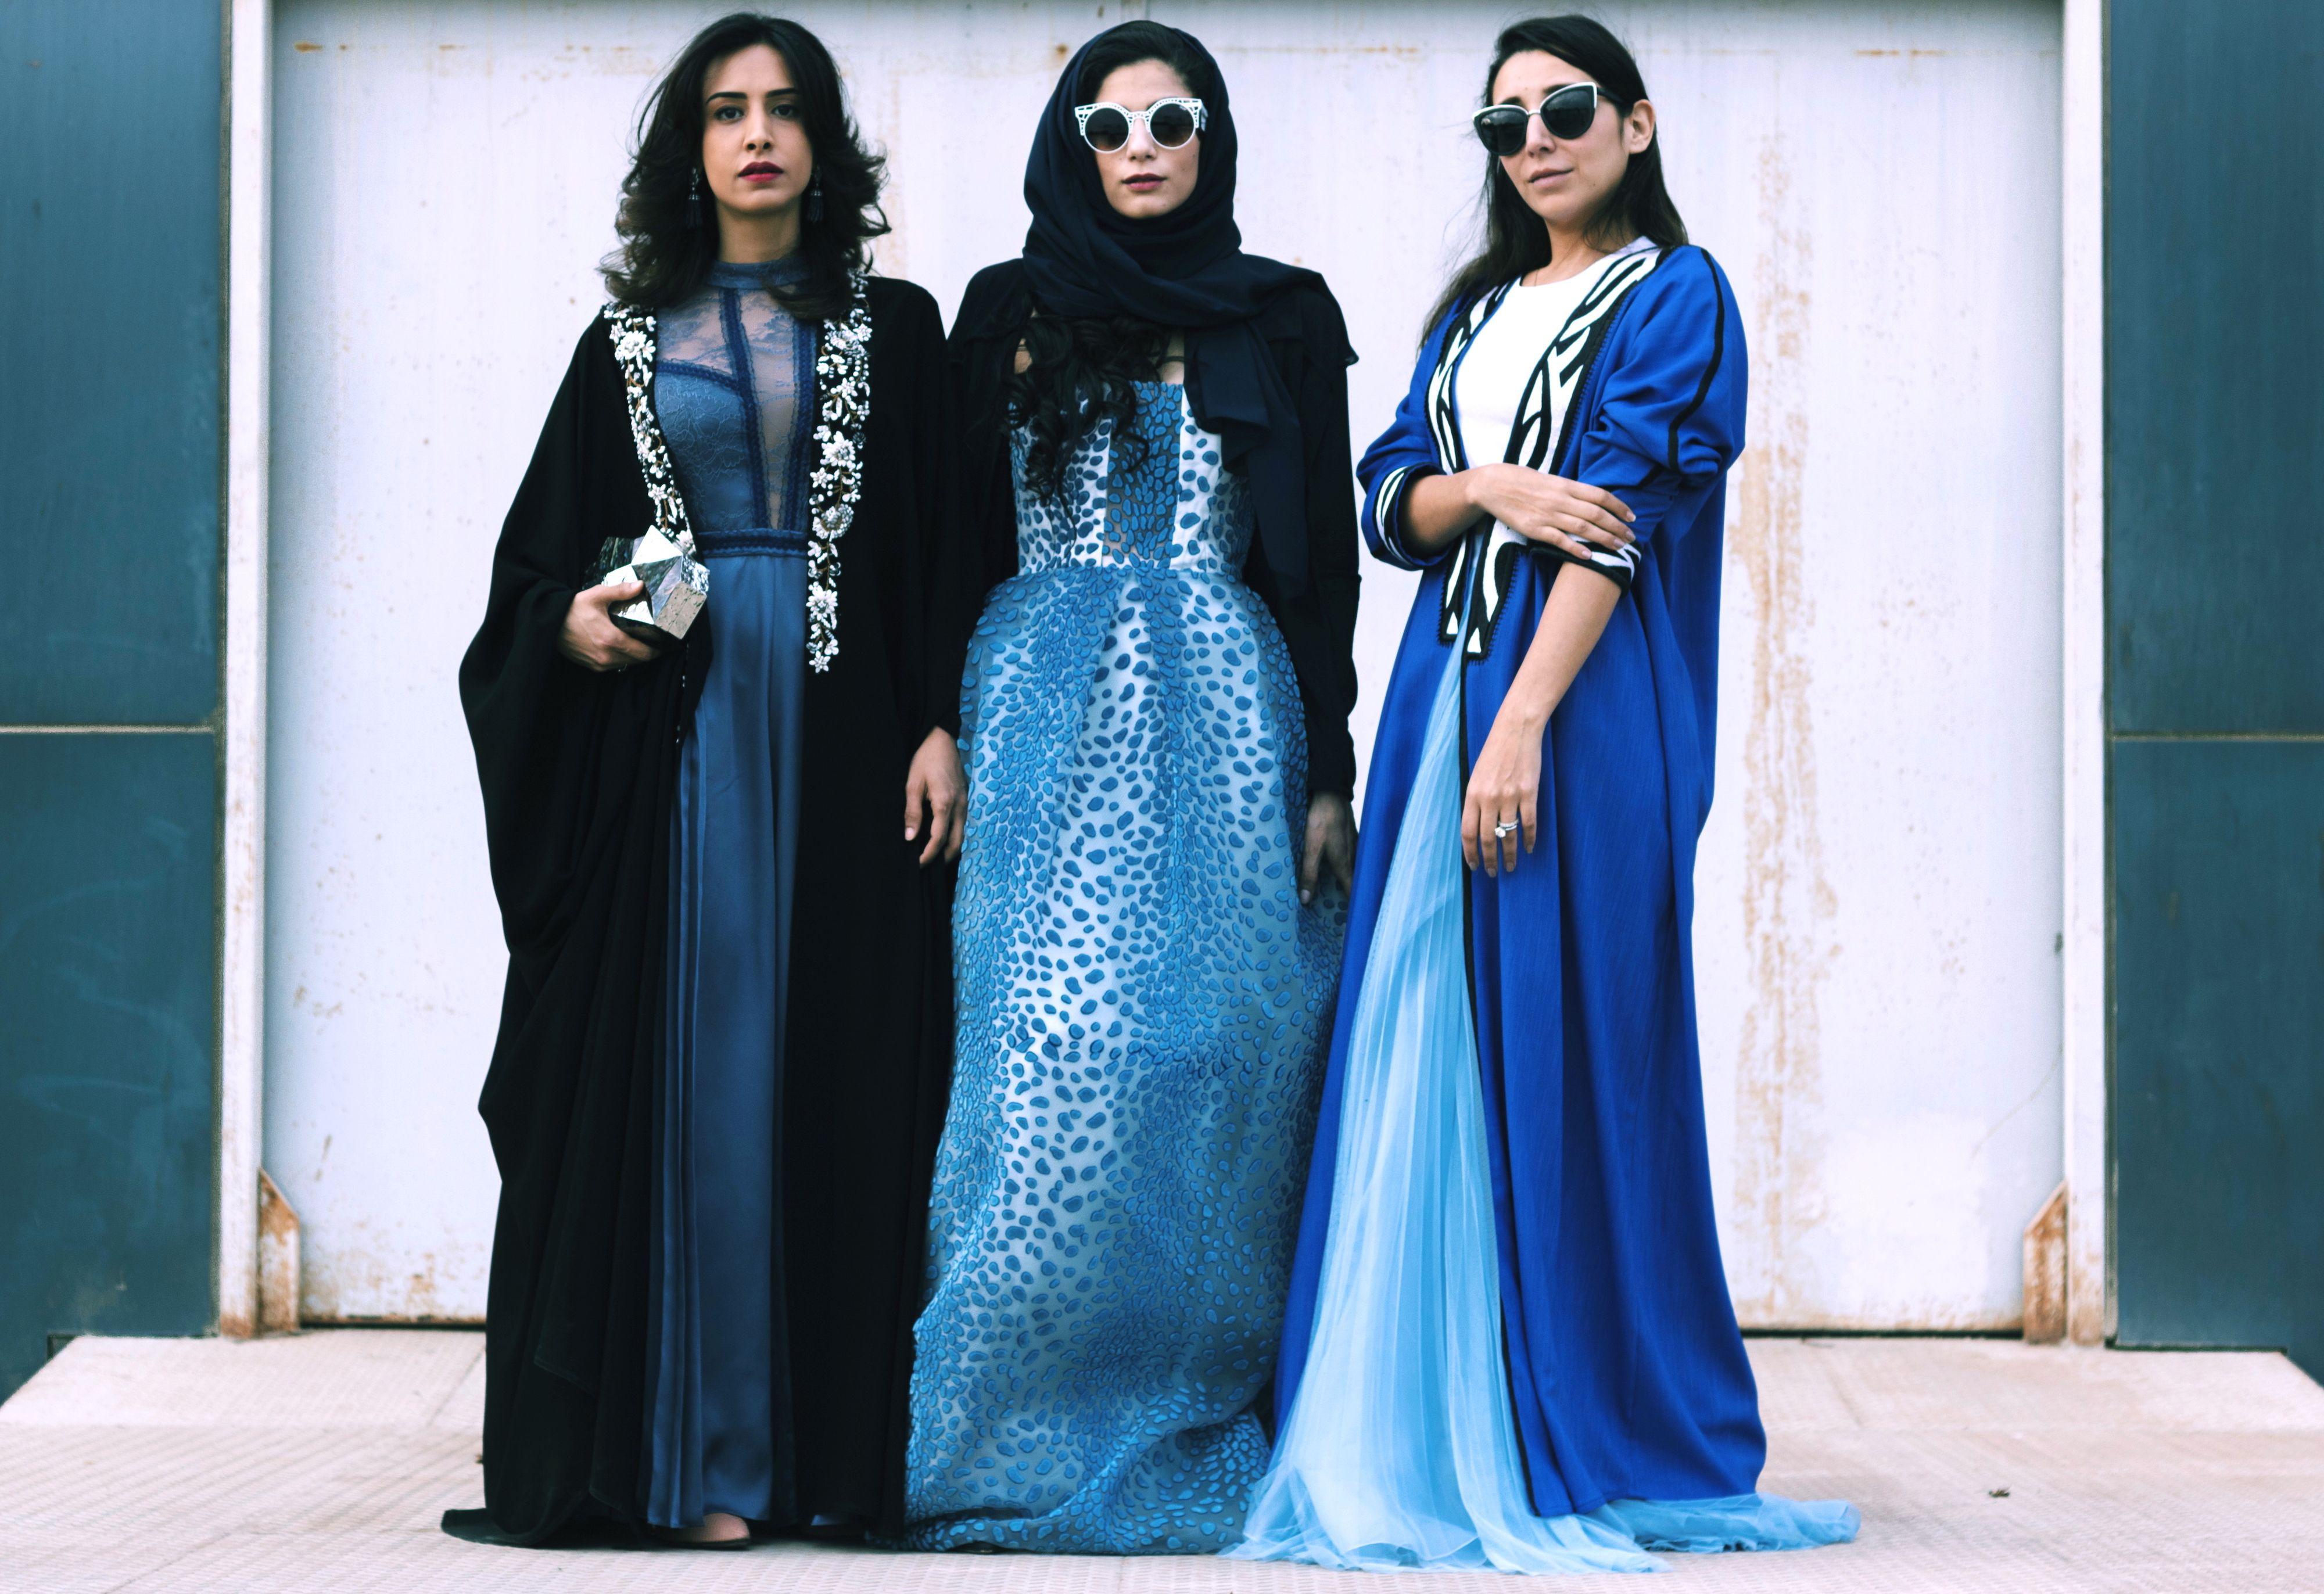 GuidareE Saudite Indossano Le Donne Possono L'abaya Finalmente 08wPnXOk